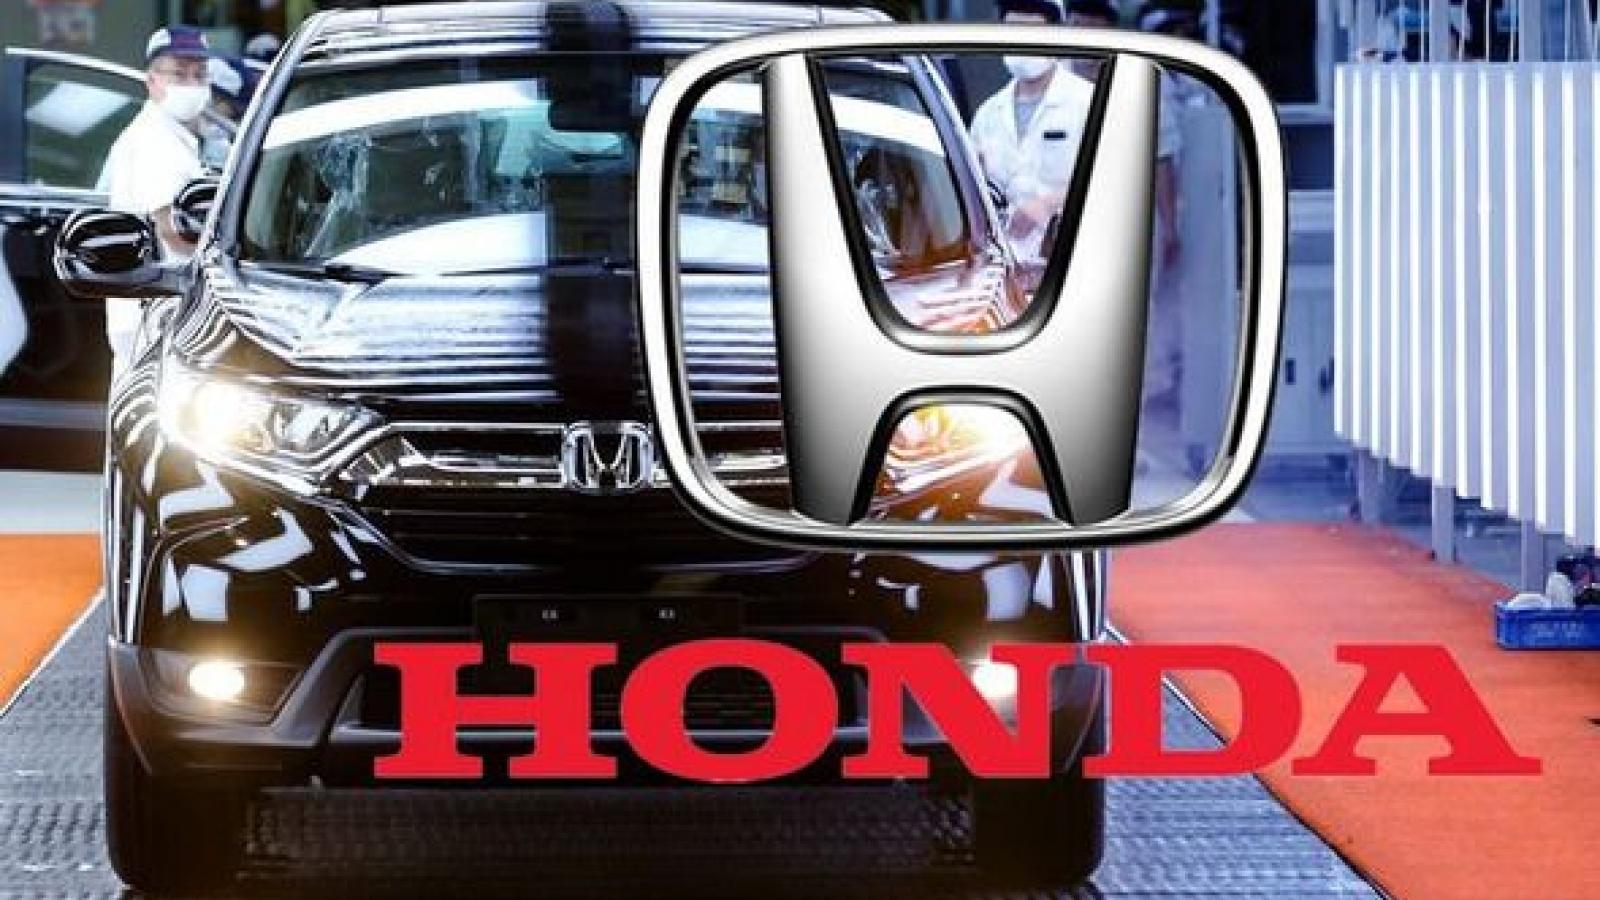 Honda triệu hồi hơn 1 triệu xe do lỗi bơm nhiên liệu